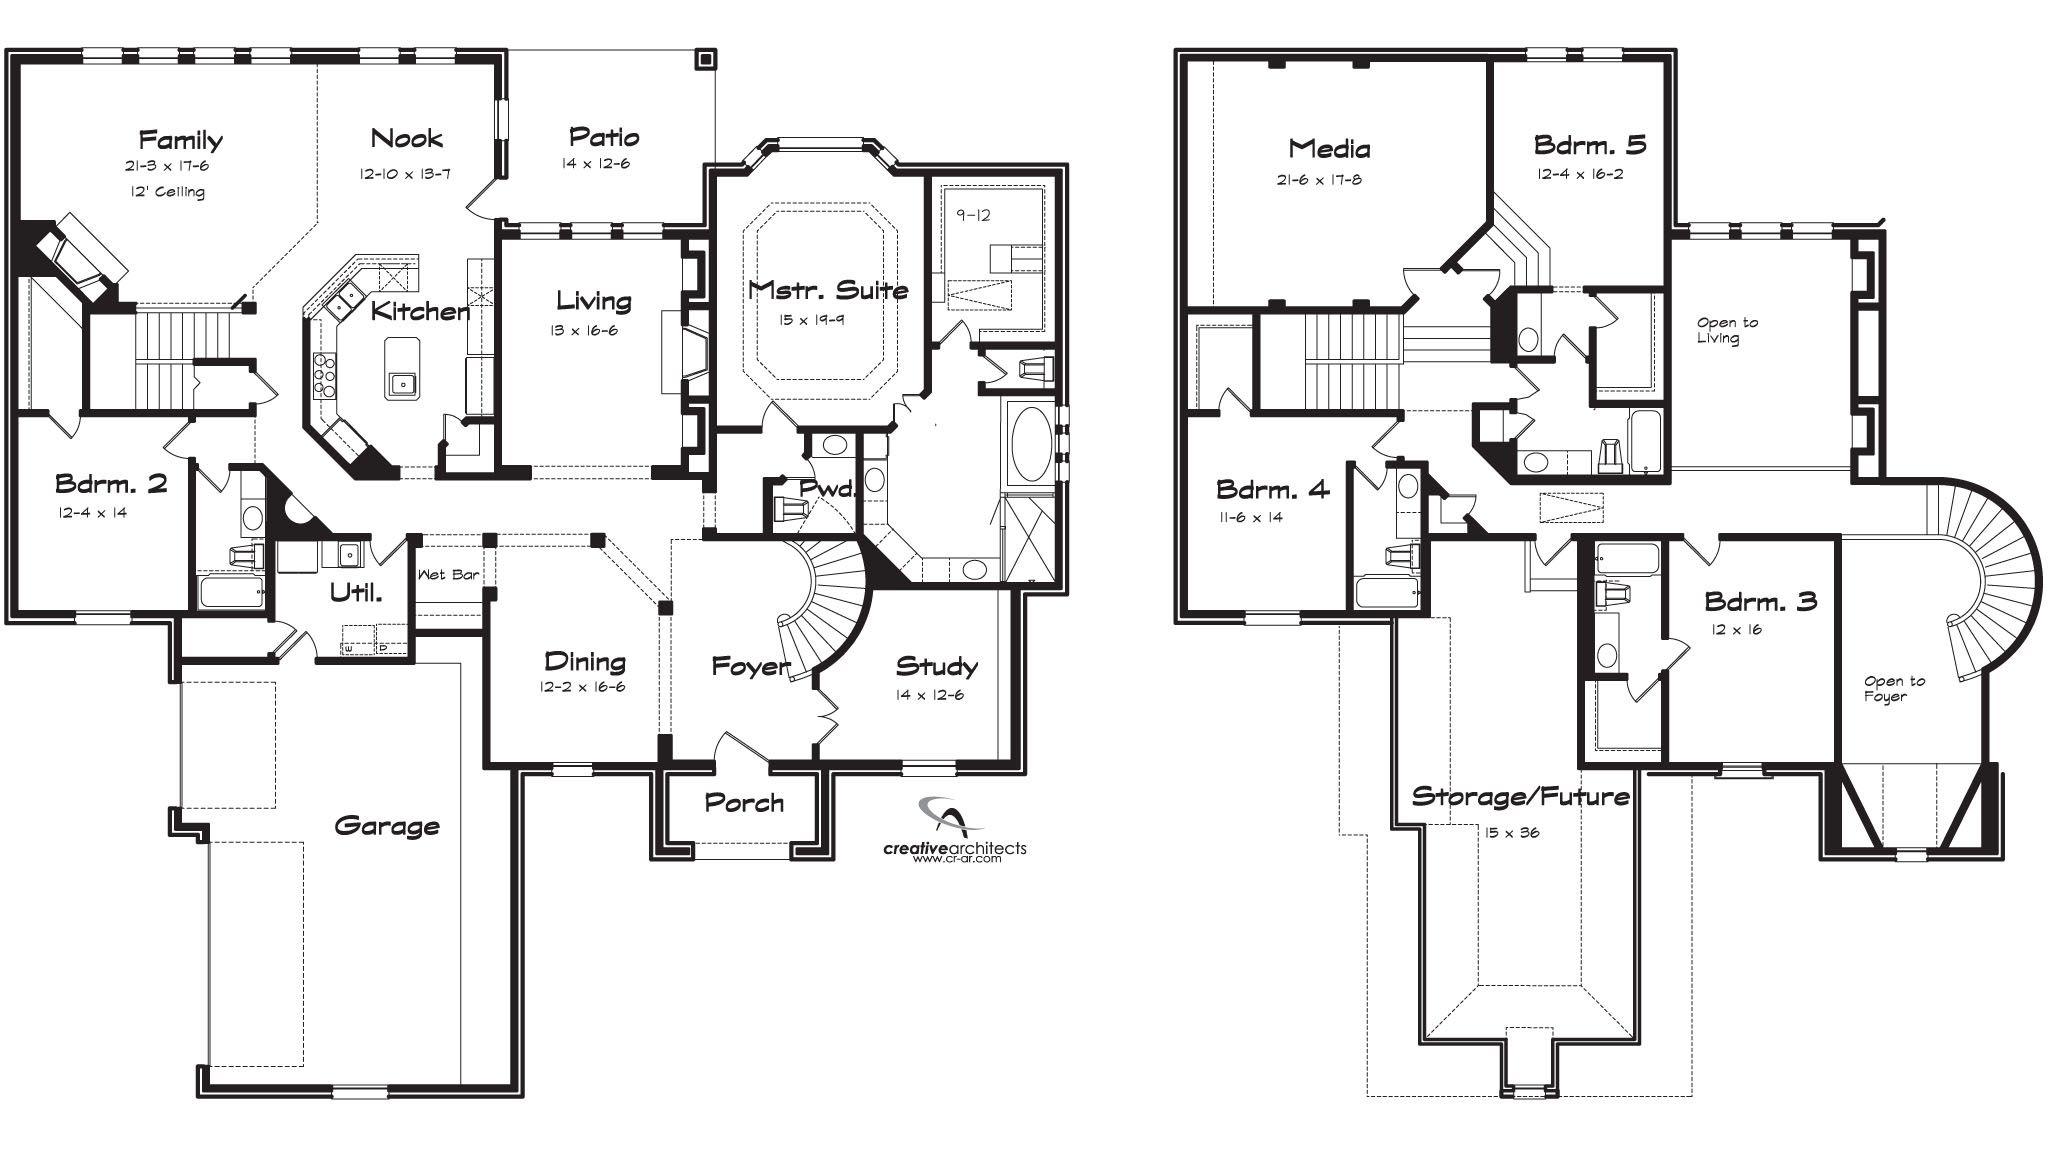 Pin by Ashley Alydane on Floorplans | Design your dream ...